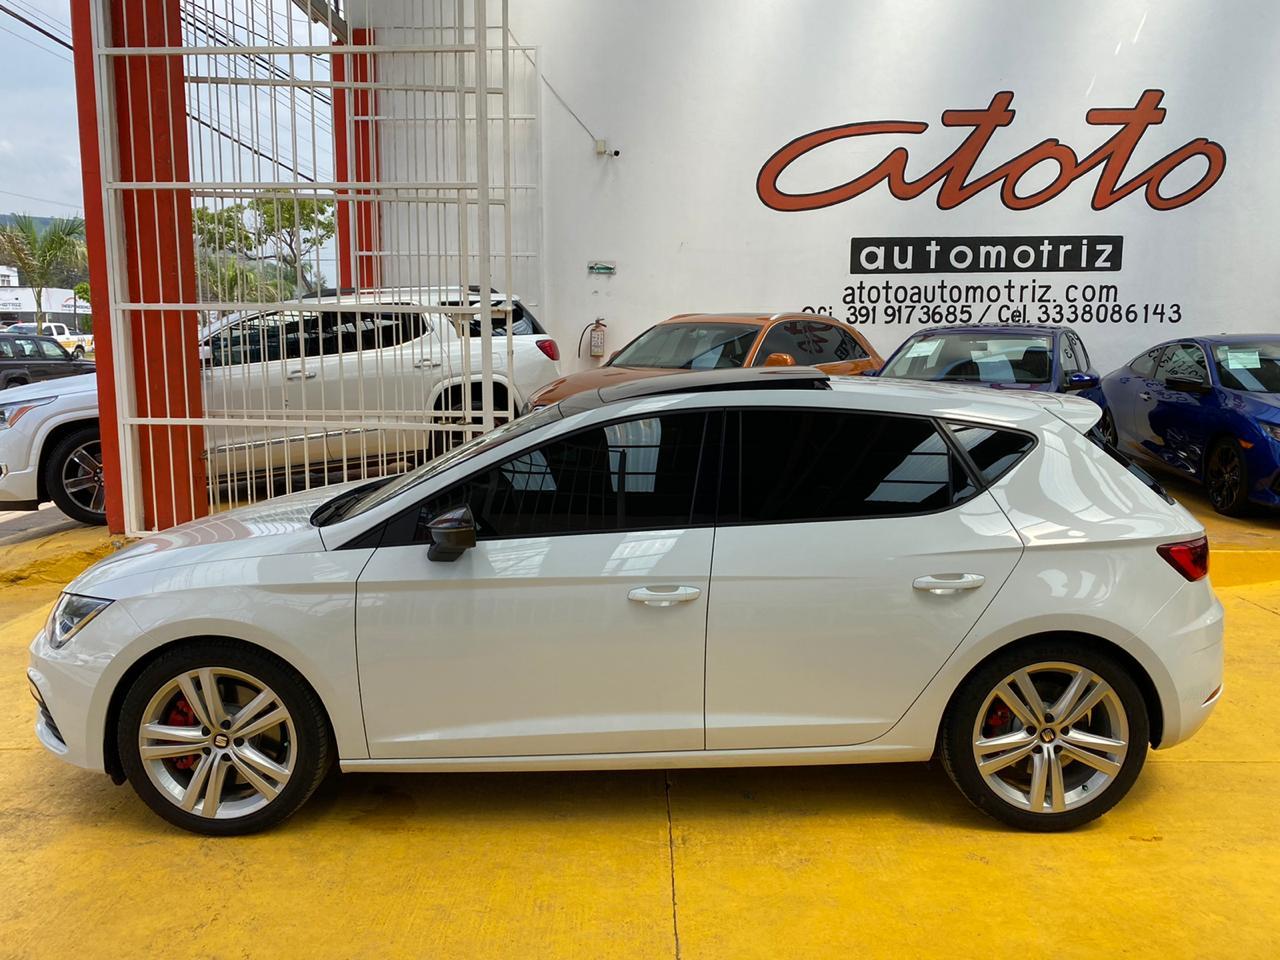 Seat Leon, 2019 At Cupra lleno